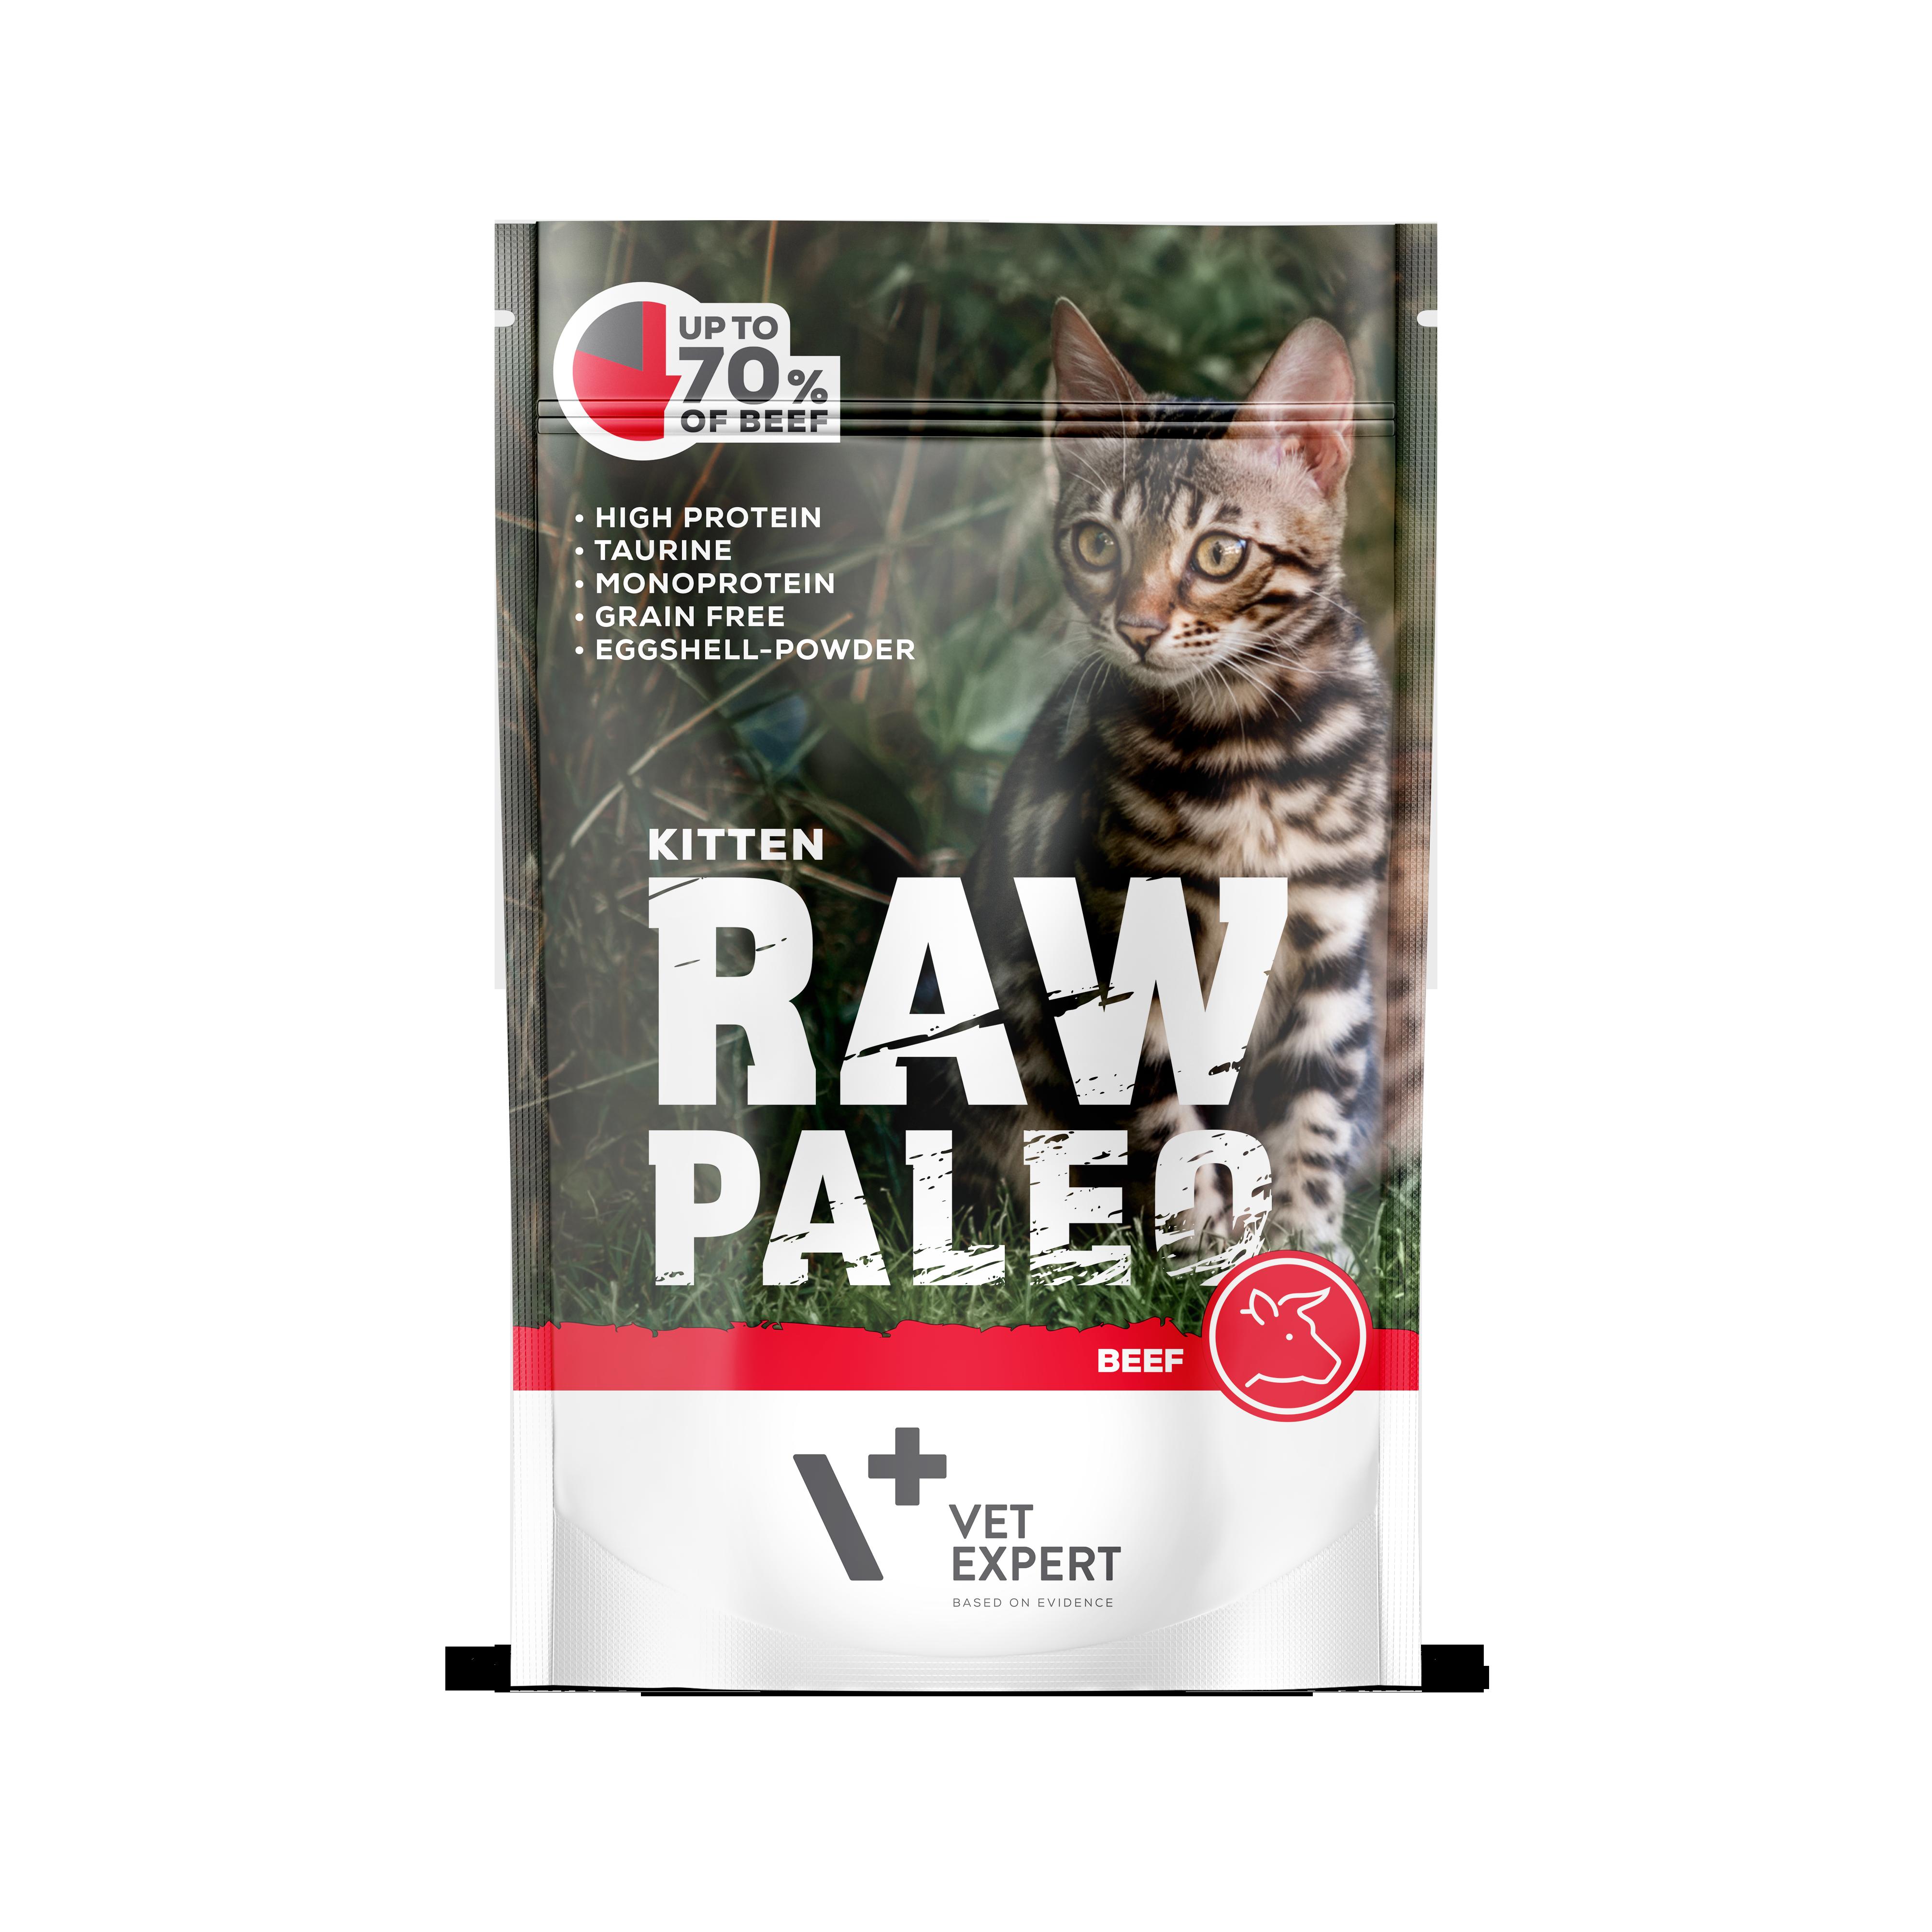 VetExpert RawPaleo Katze Kitten Katzenfutter Rind Premium getreidefreies Katzenfutter, Alleinfuttermittel, Trockenfutter, Nassfutter, Katzenbedarf, Katzennahrung, Katzenernährung